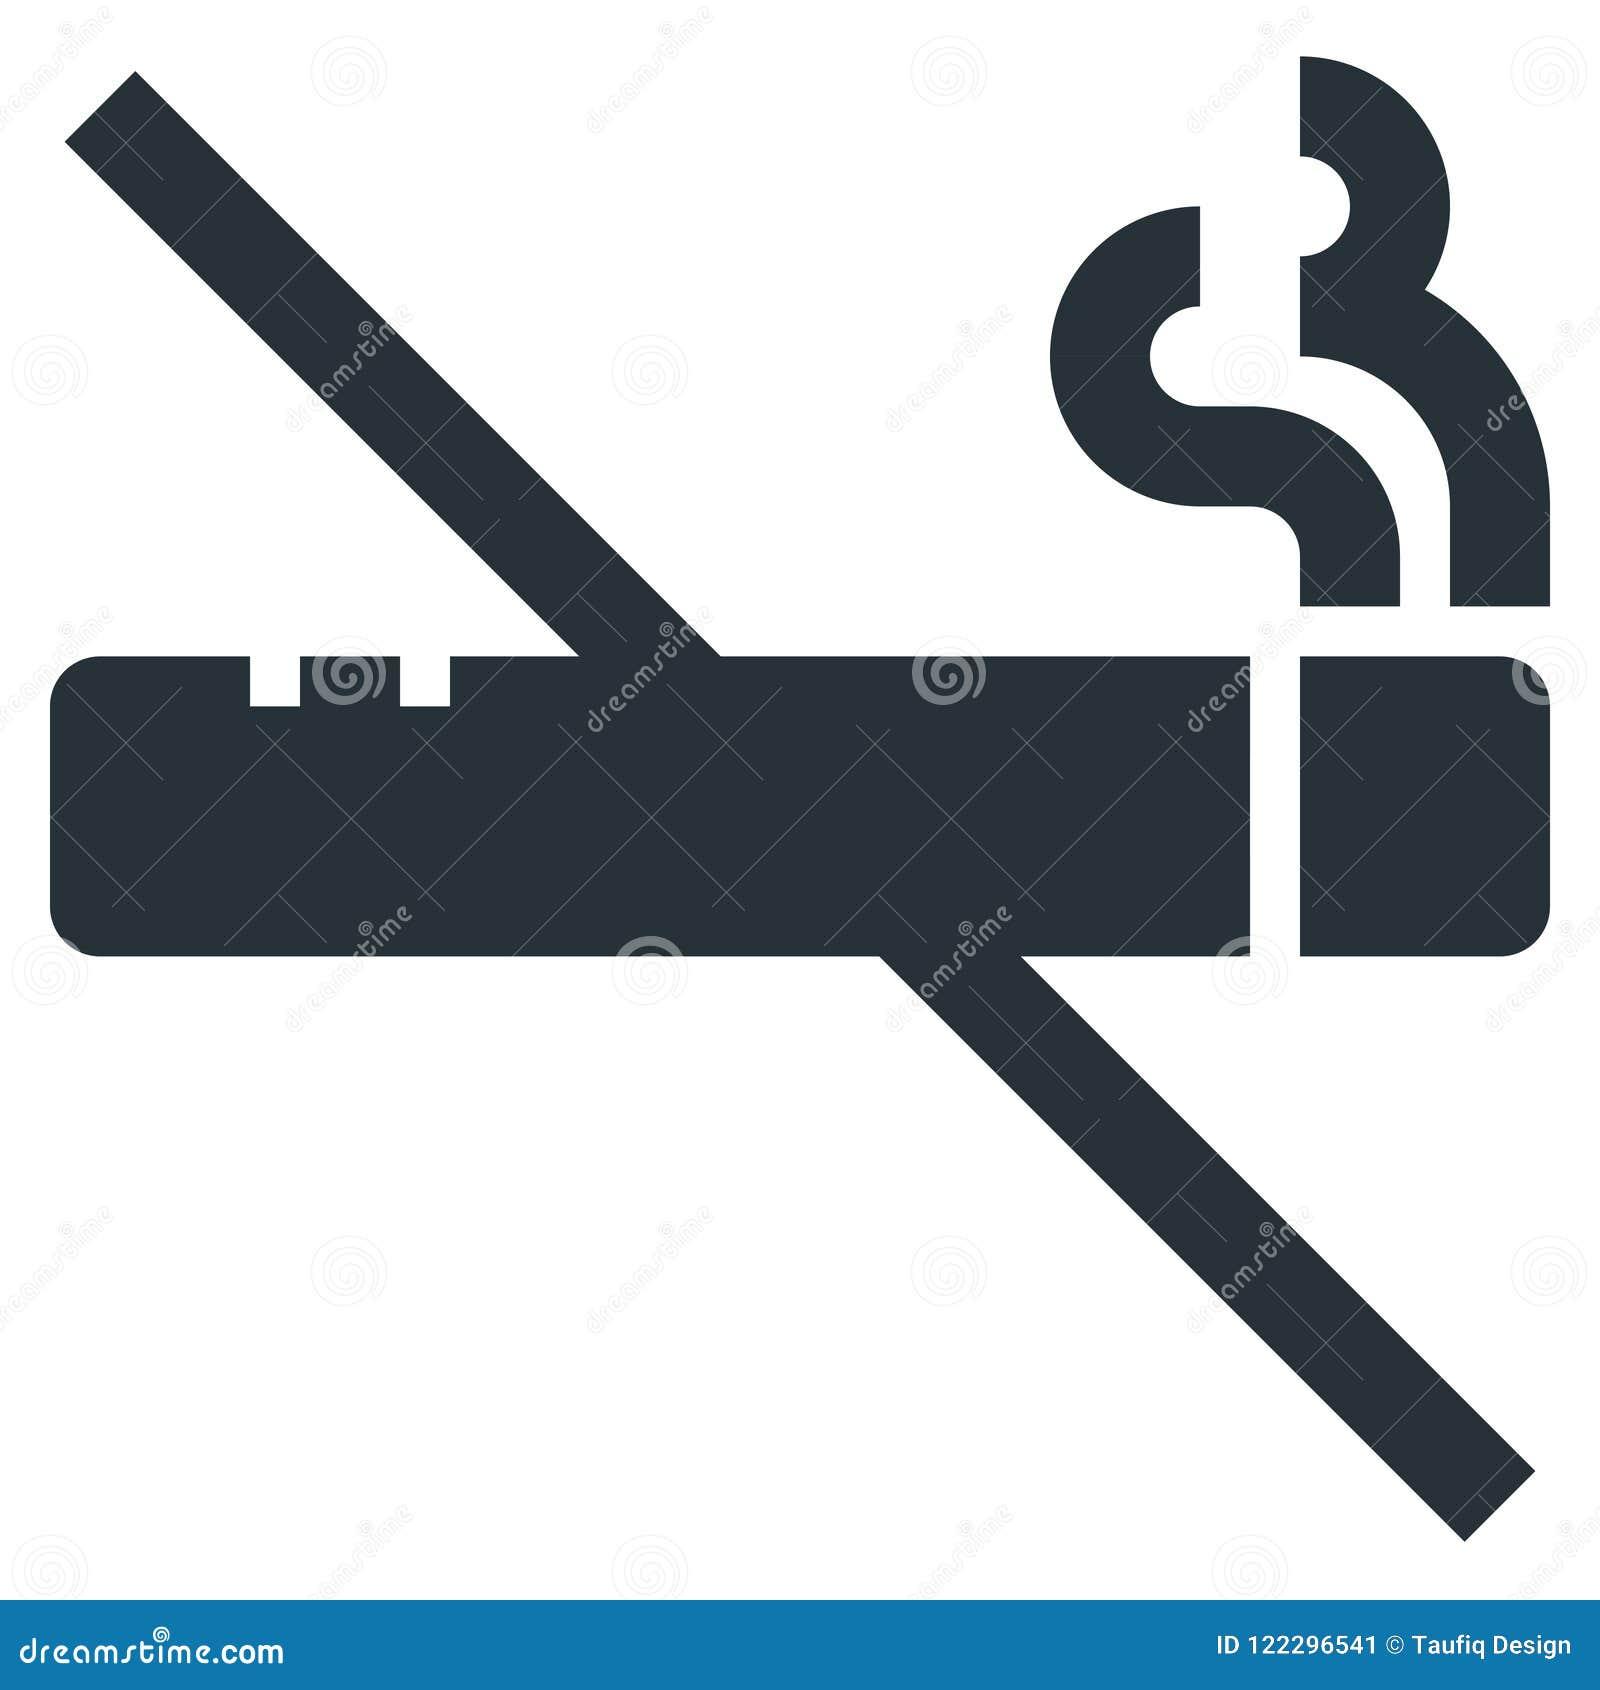 Smoking Ban Vector Line Icon 32x32 Pixel Perfect  Editable 2